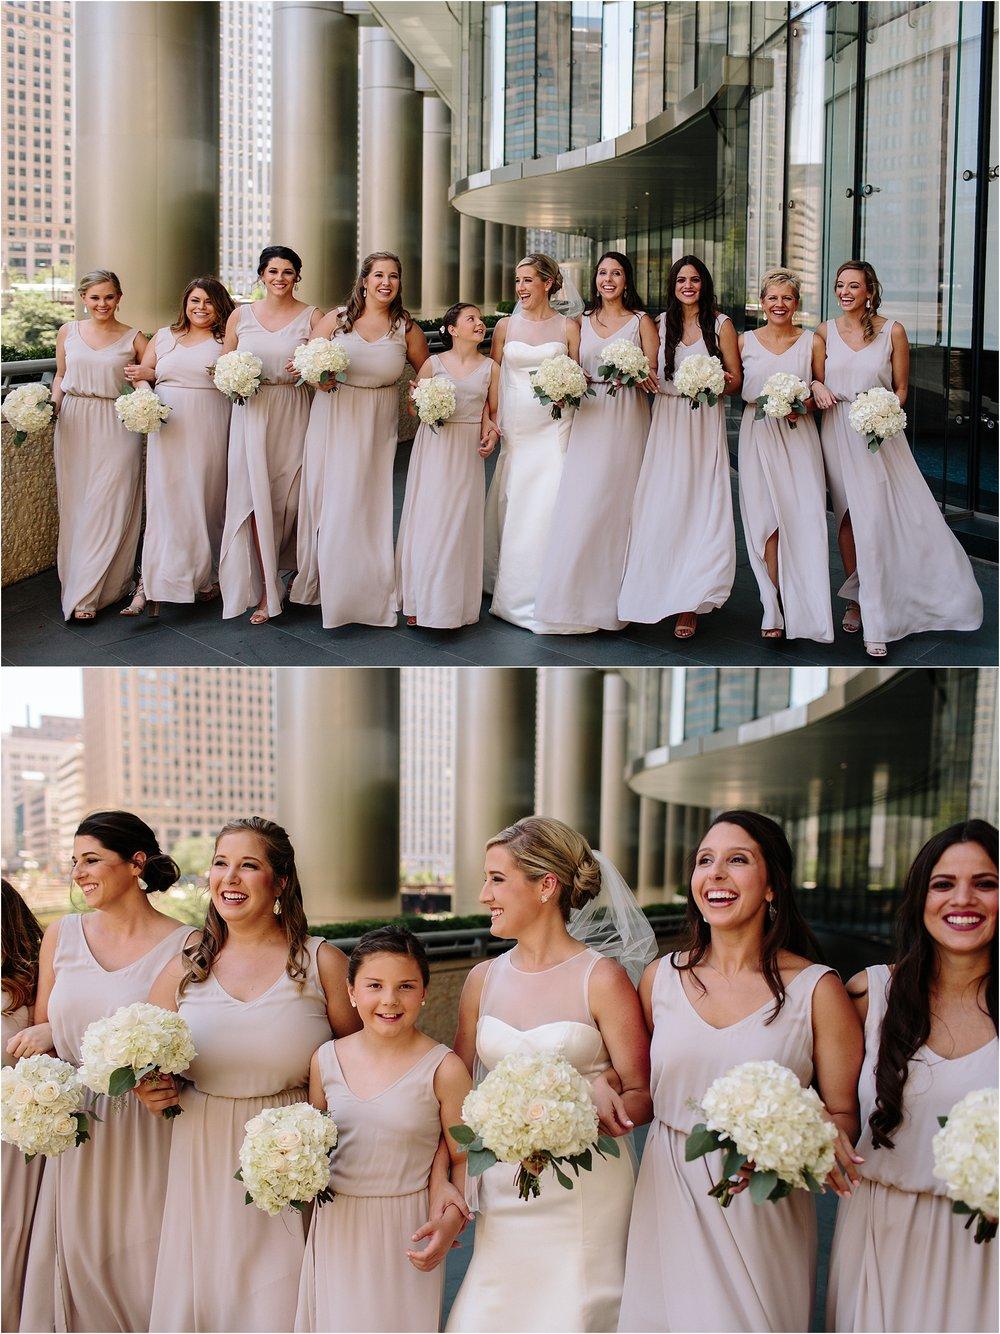 chicago-wedding-photographer-61.jpg